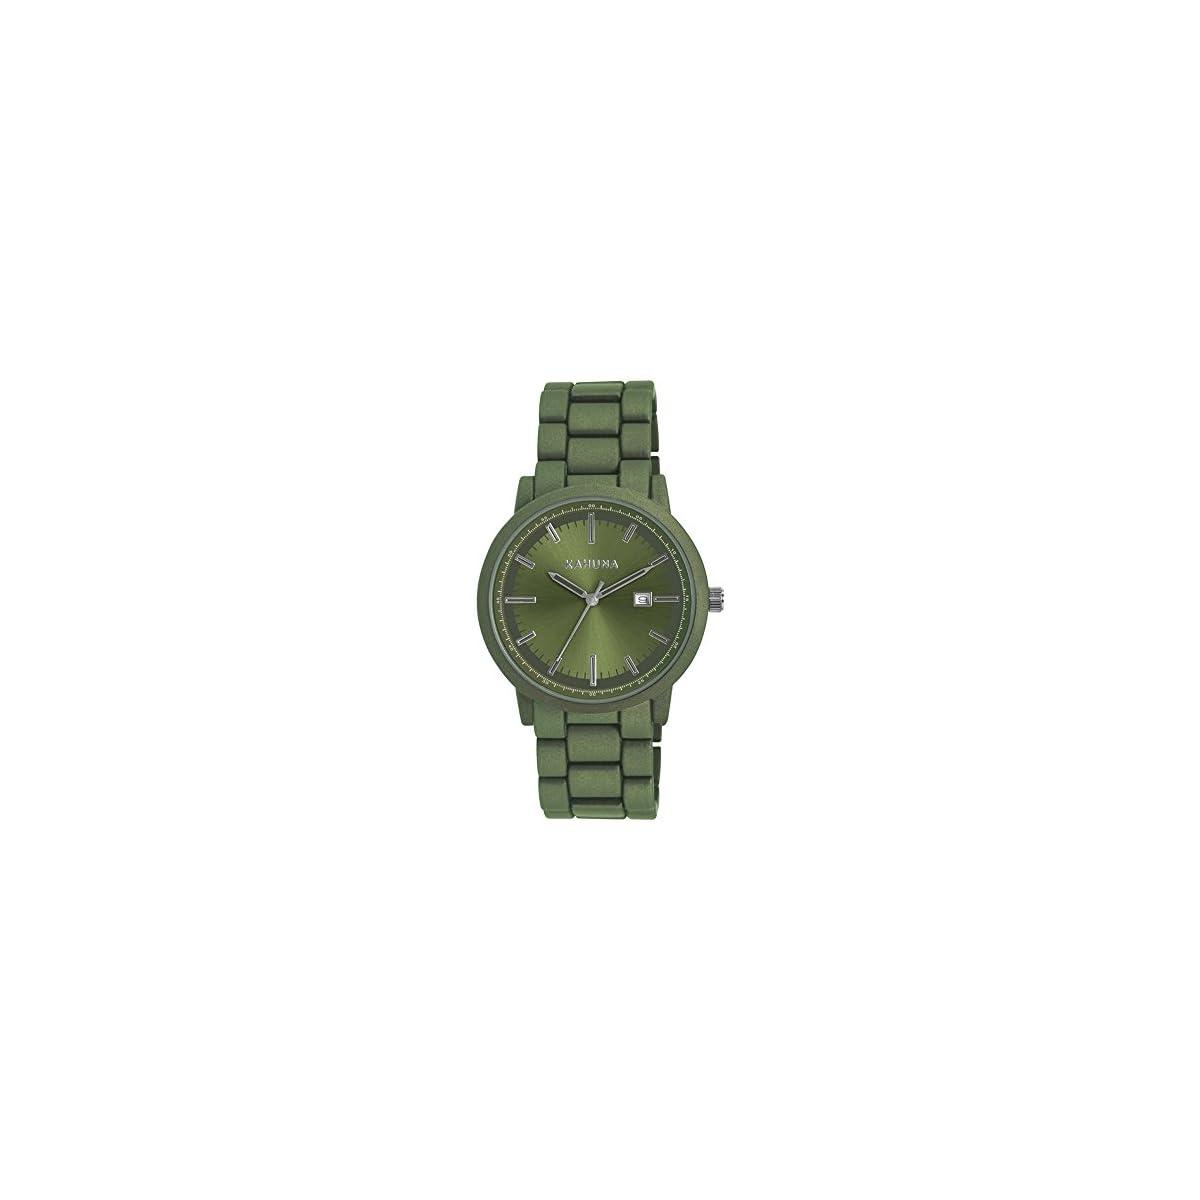 41FmldEF0qL. SS1200  - Kahuna KGB-0006G Kahuna KGB-0006G Reloj De Hombre